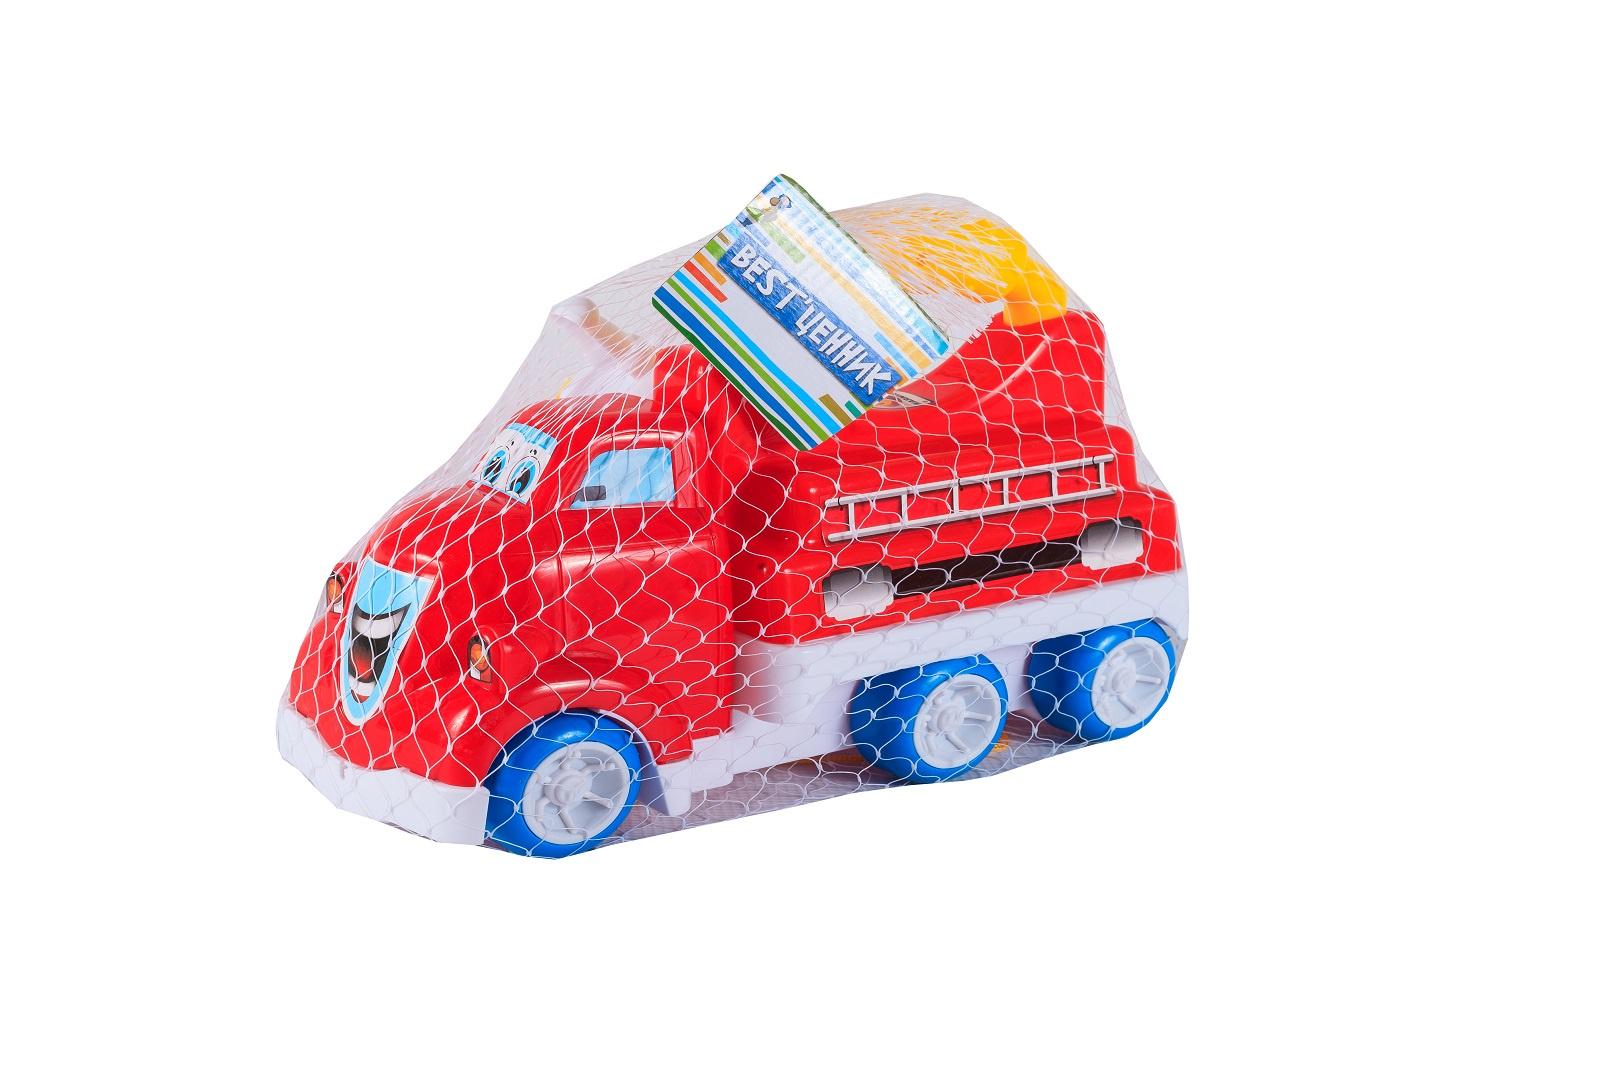 Машинка-игрушка S+S Стройтехника, 200149193, с аксессуарами s s toys 012 03 с фигурками и аксессуарами